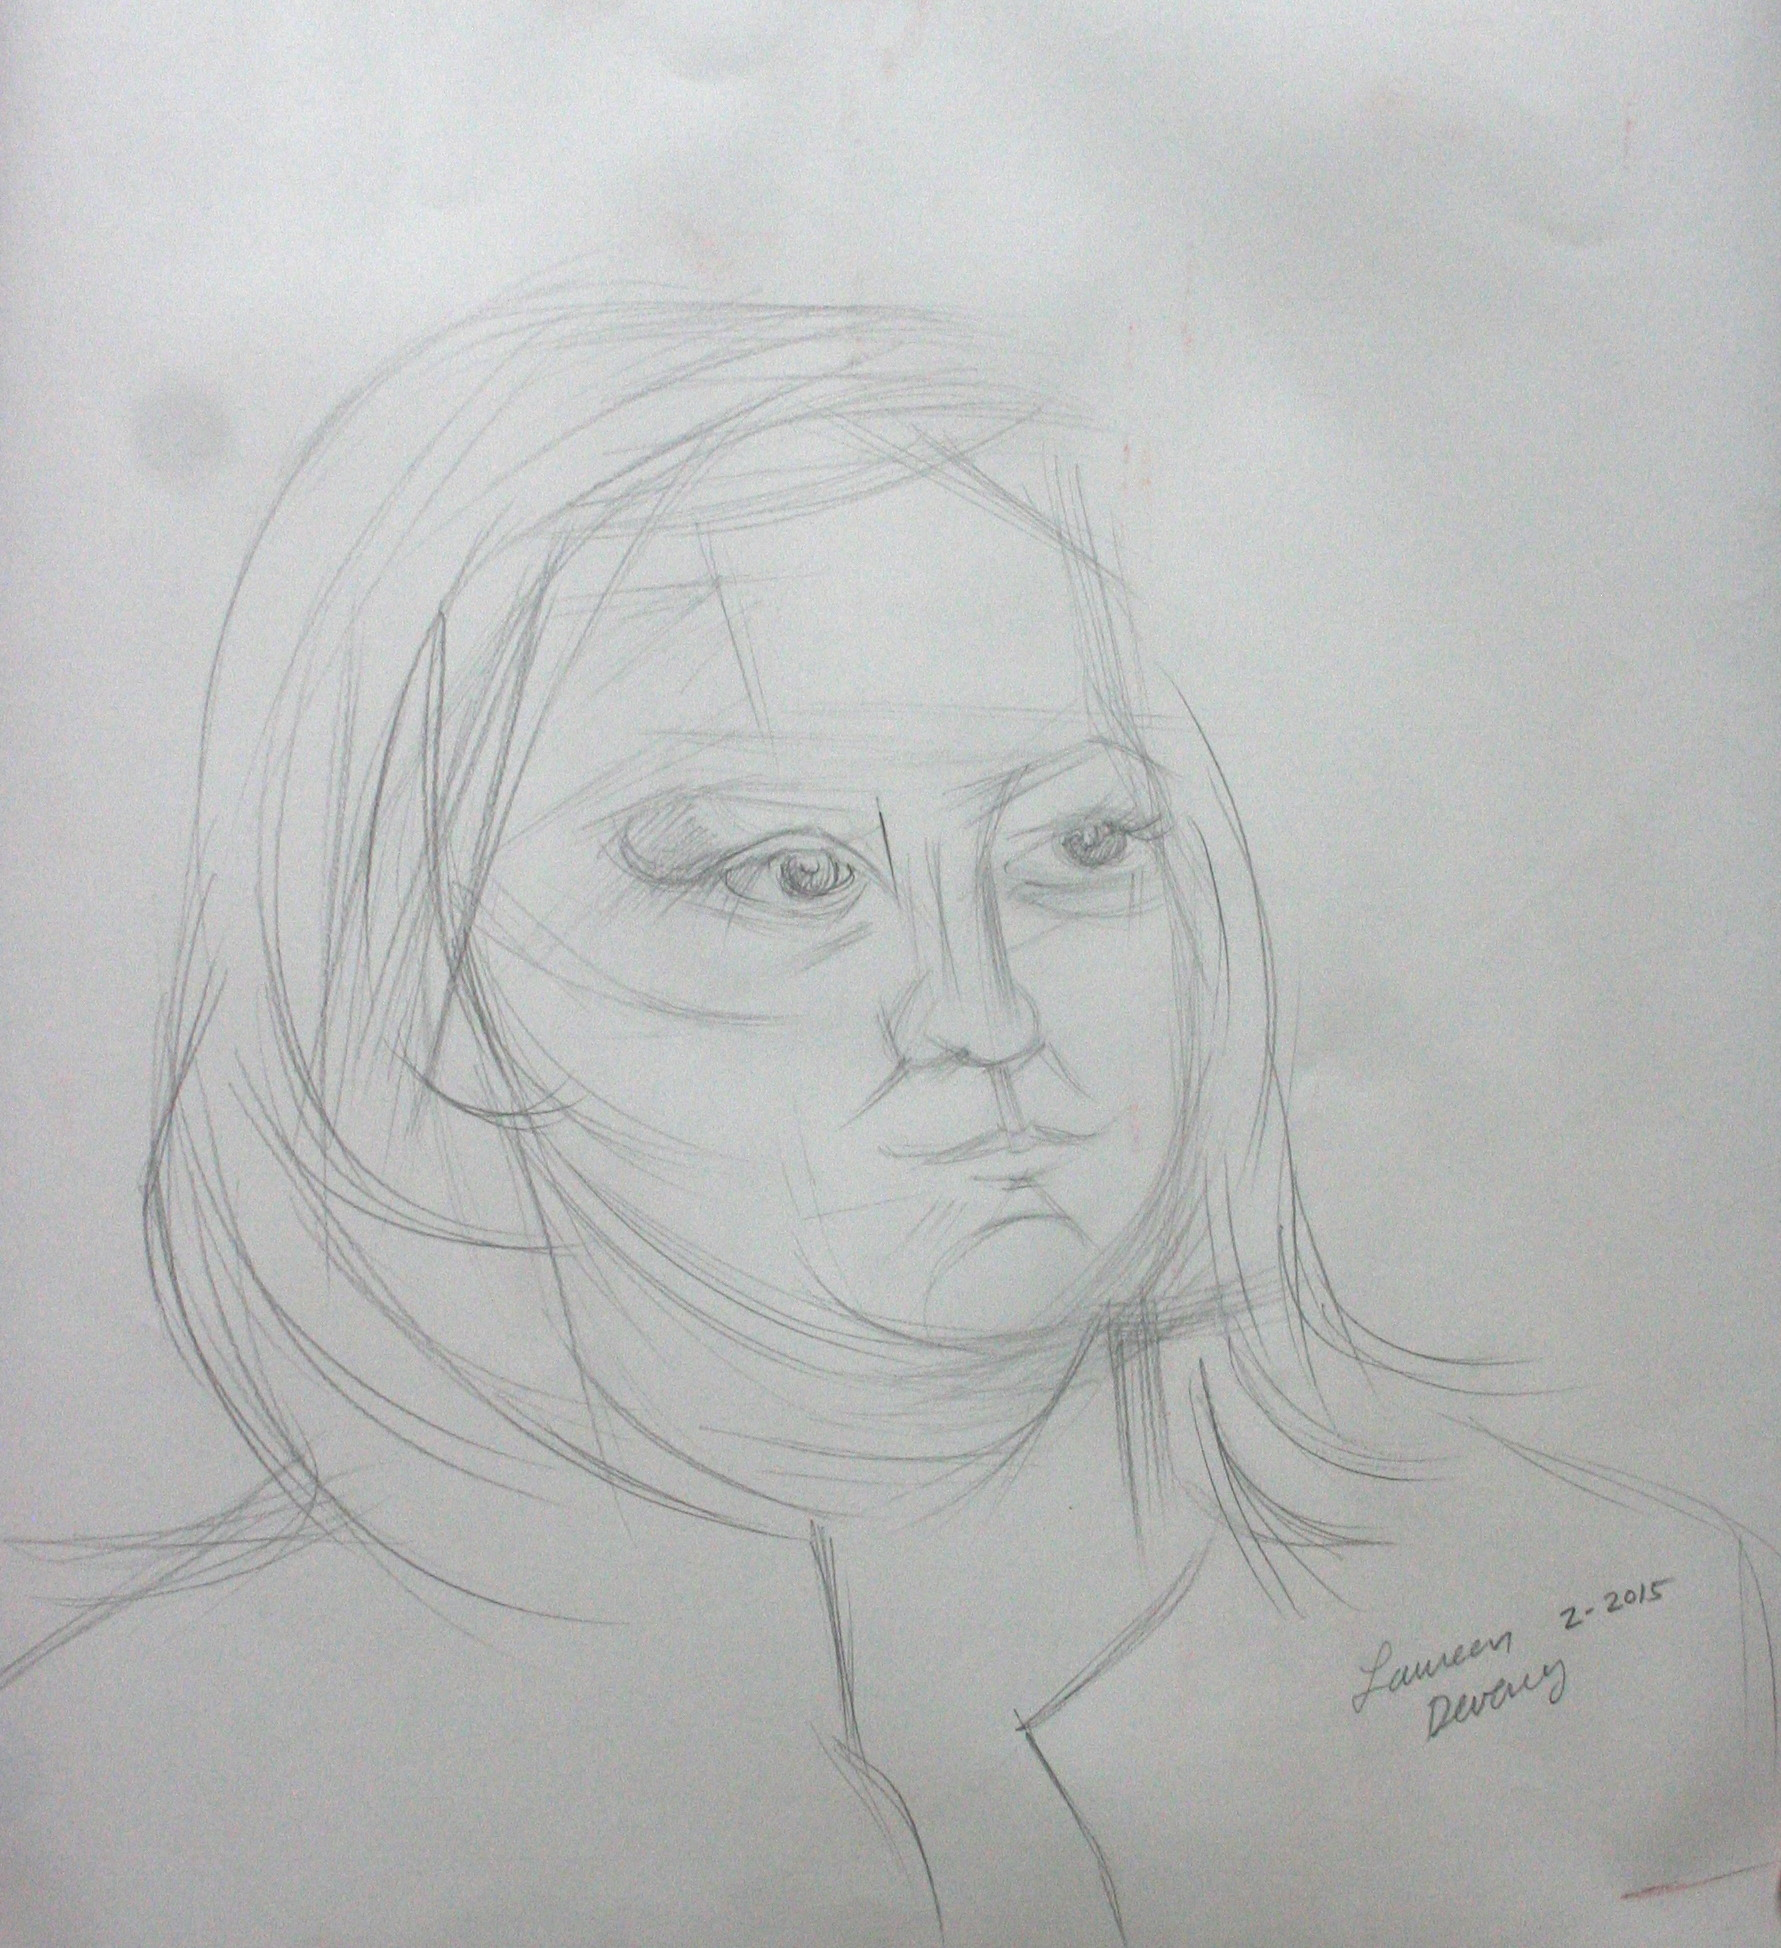 Laureen Deveney did this hour drawing.